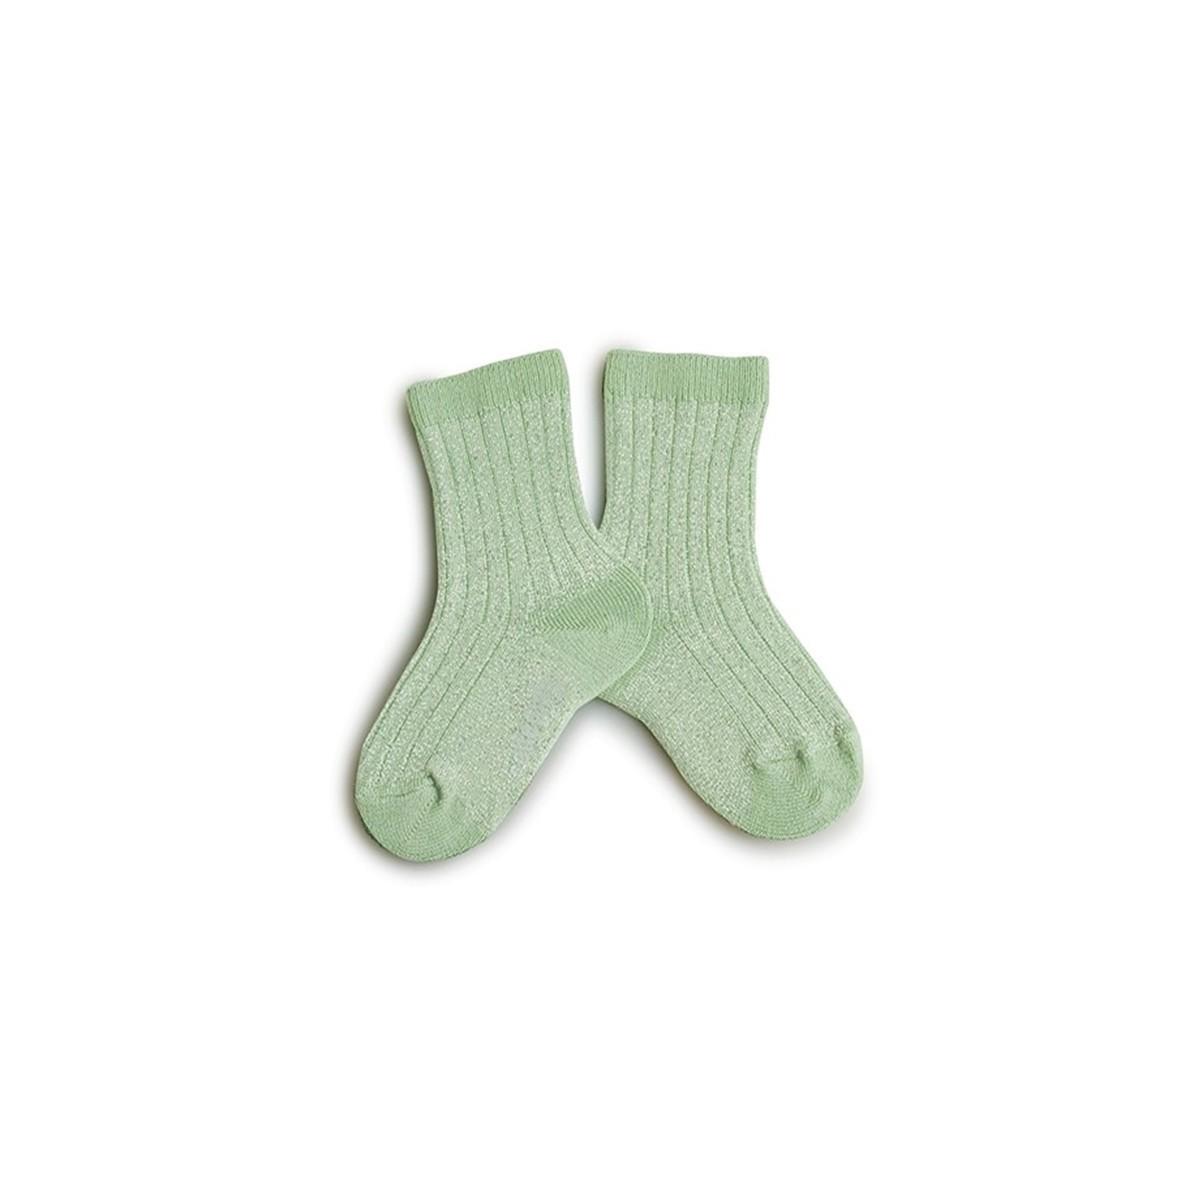 Mi chaussettes brillantes Vert Tileul